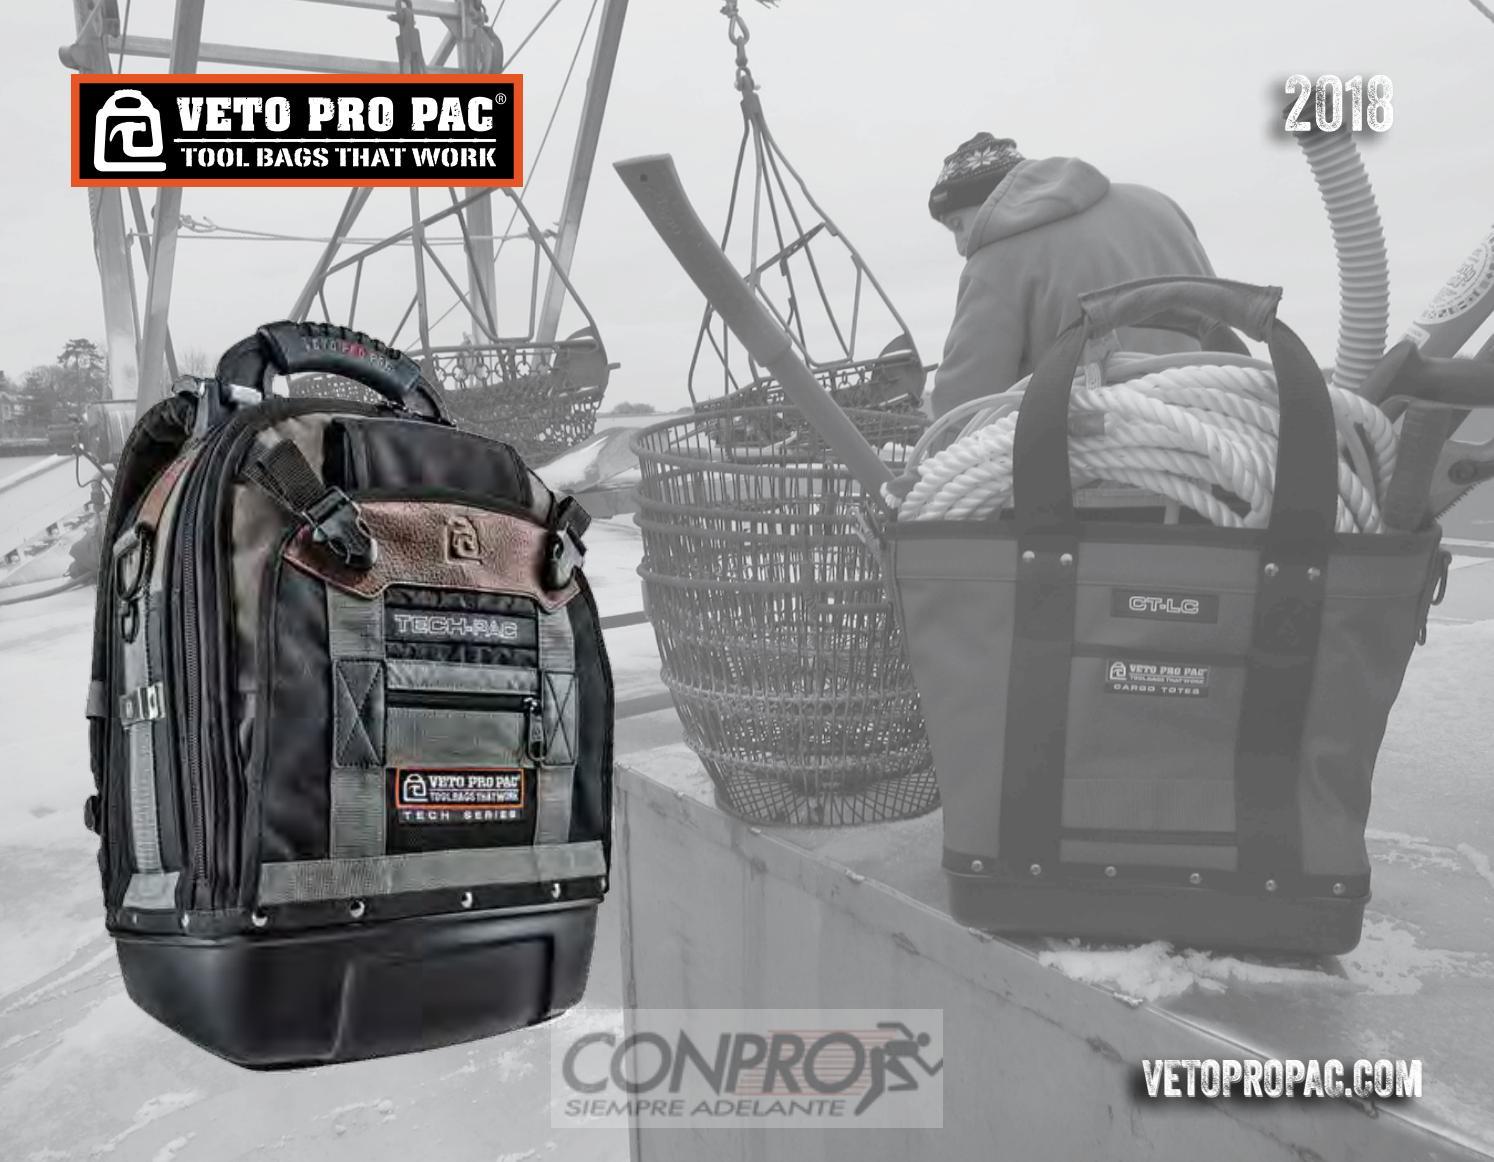 VETO PRO PAC TECH XL TOUGH TOOL BAG 14 NEOPRENE POCKETS 80 TIERED POCKETS